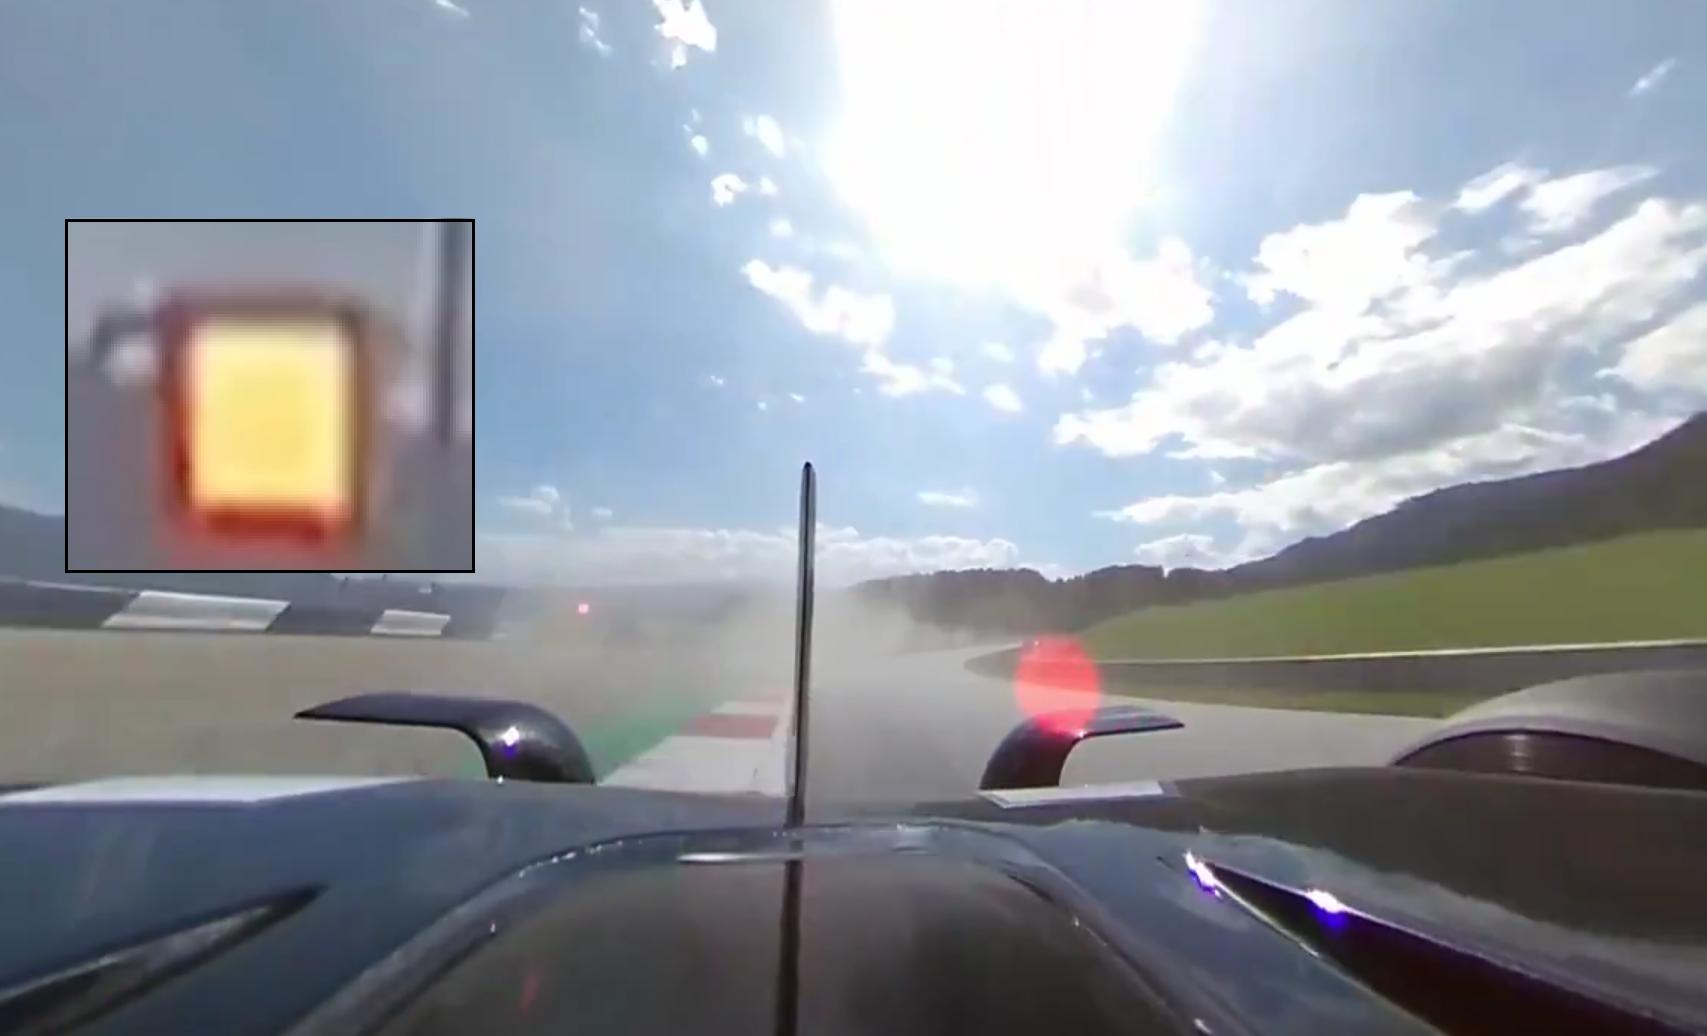 Onboard Footage from Lewis Hamilton's Car Passing Valtteri Bottas